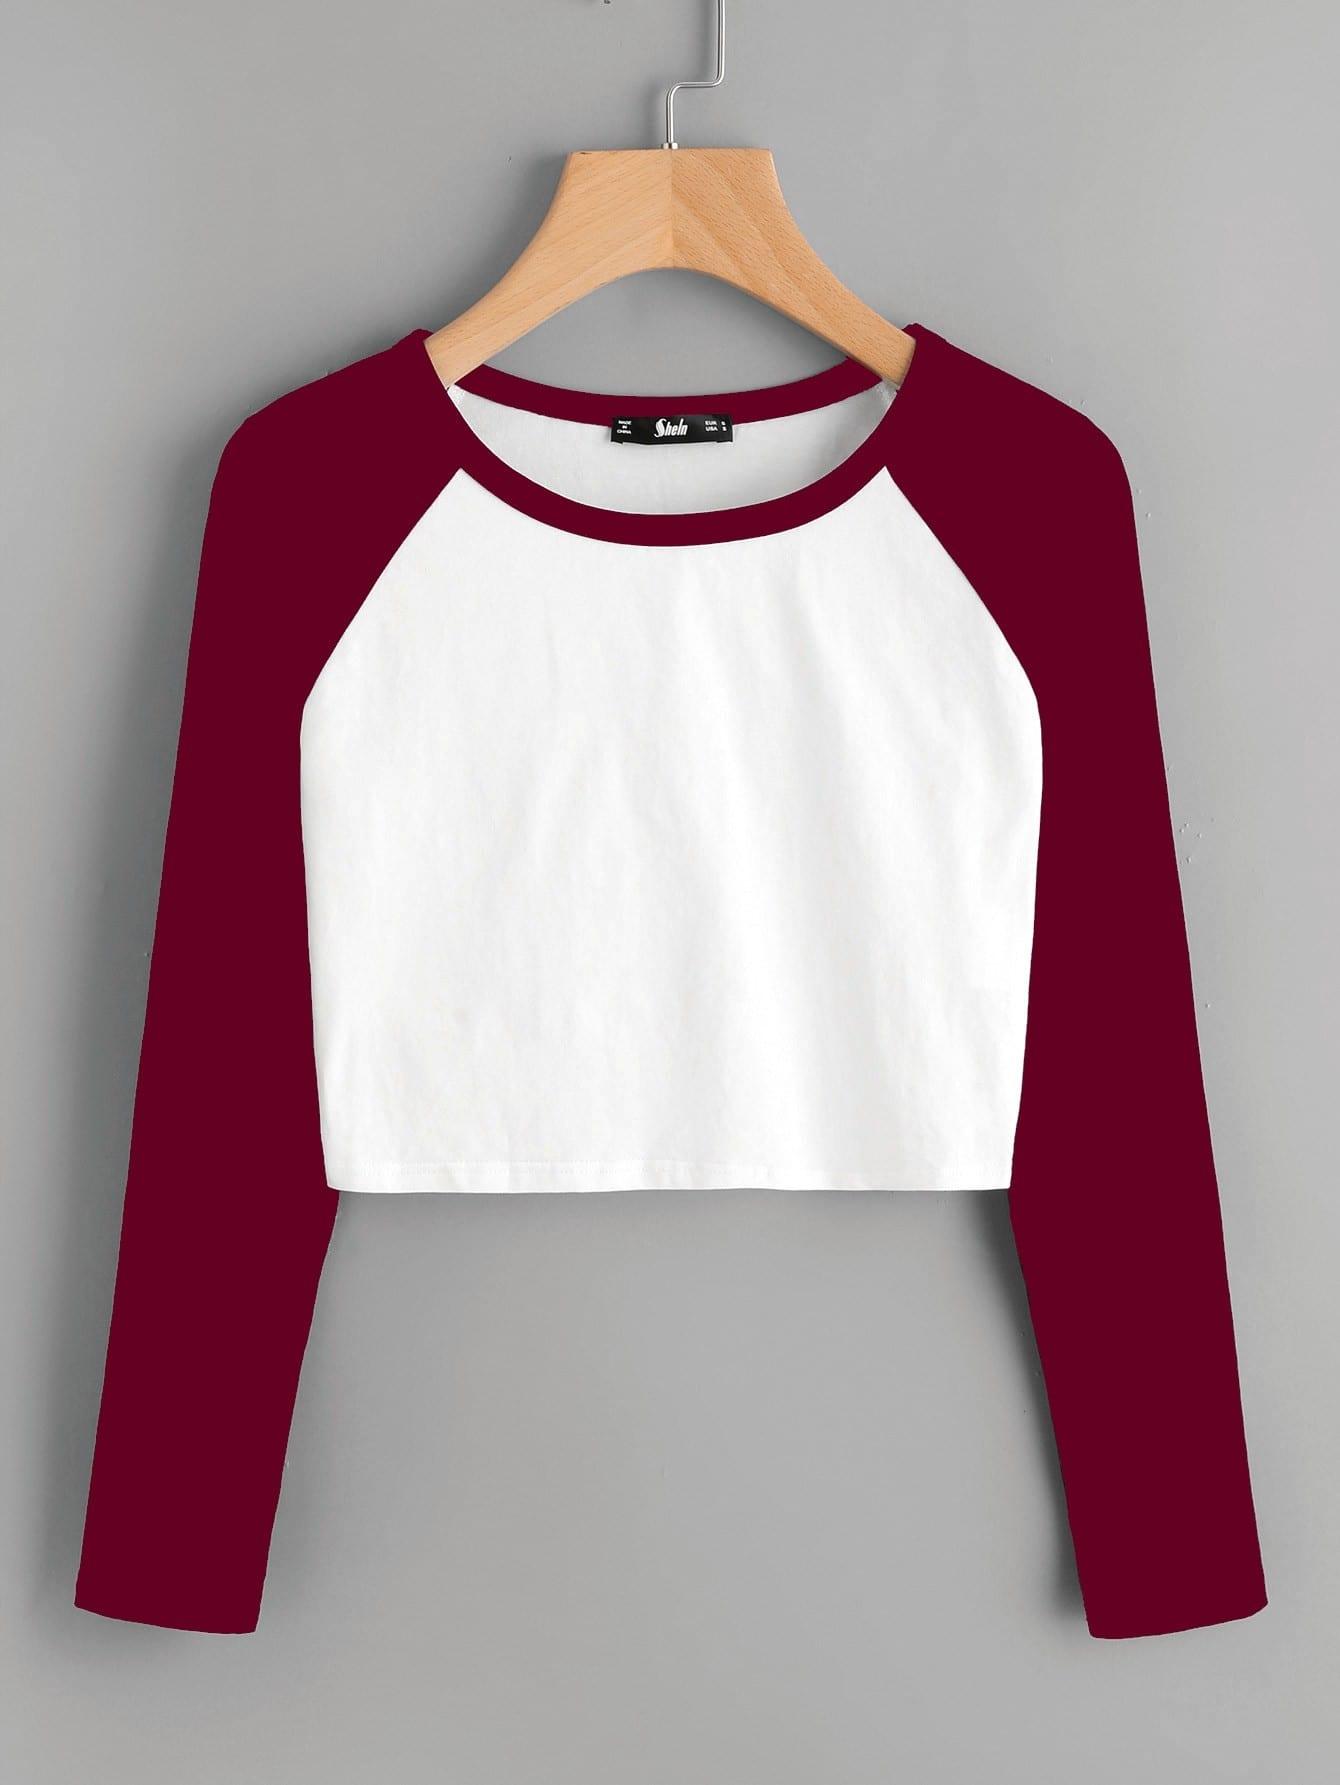 Contrast Raglan Sleeve Crop T-shirt christmas raglan sleeve jingle belly t shirt